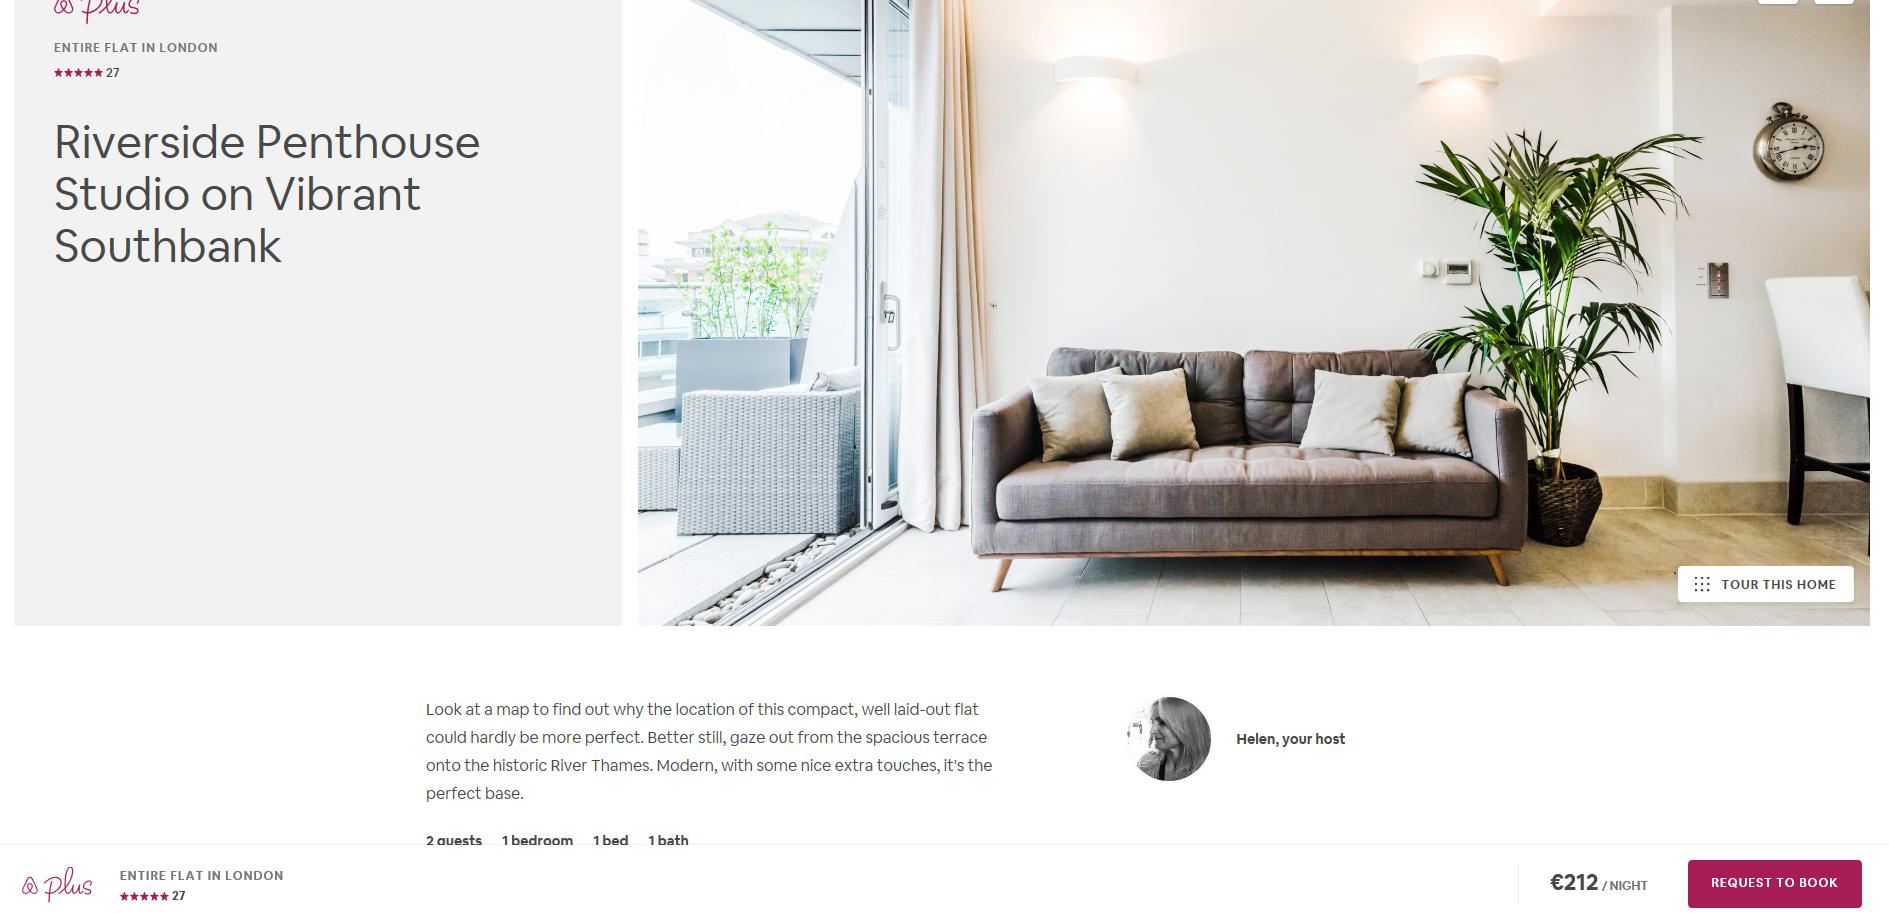 Airbnb London listing